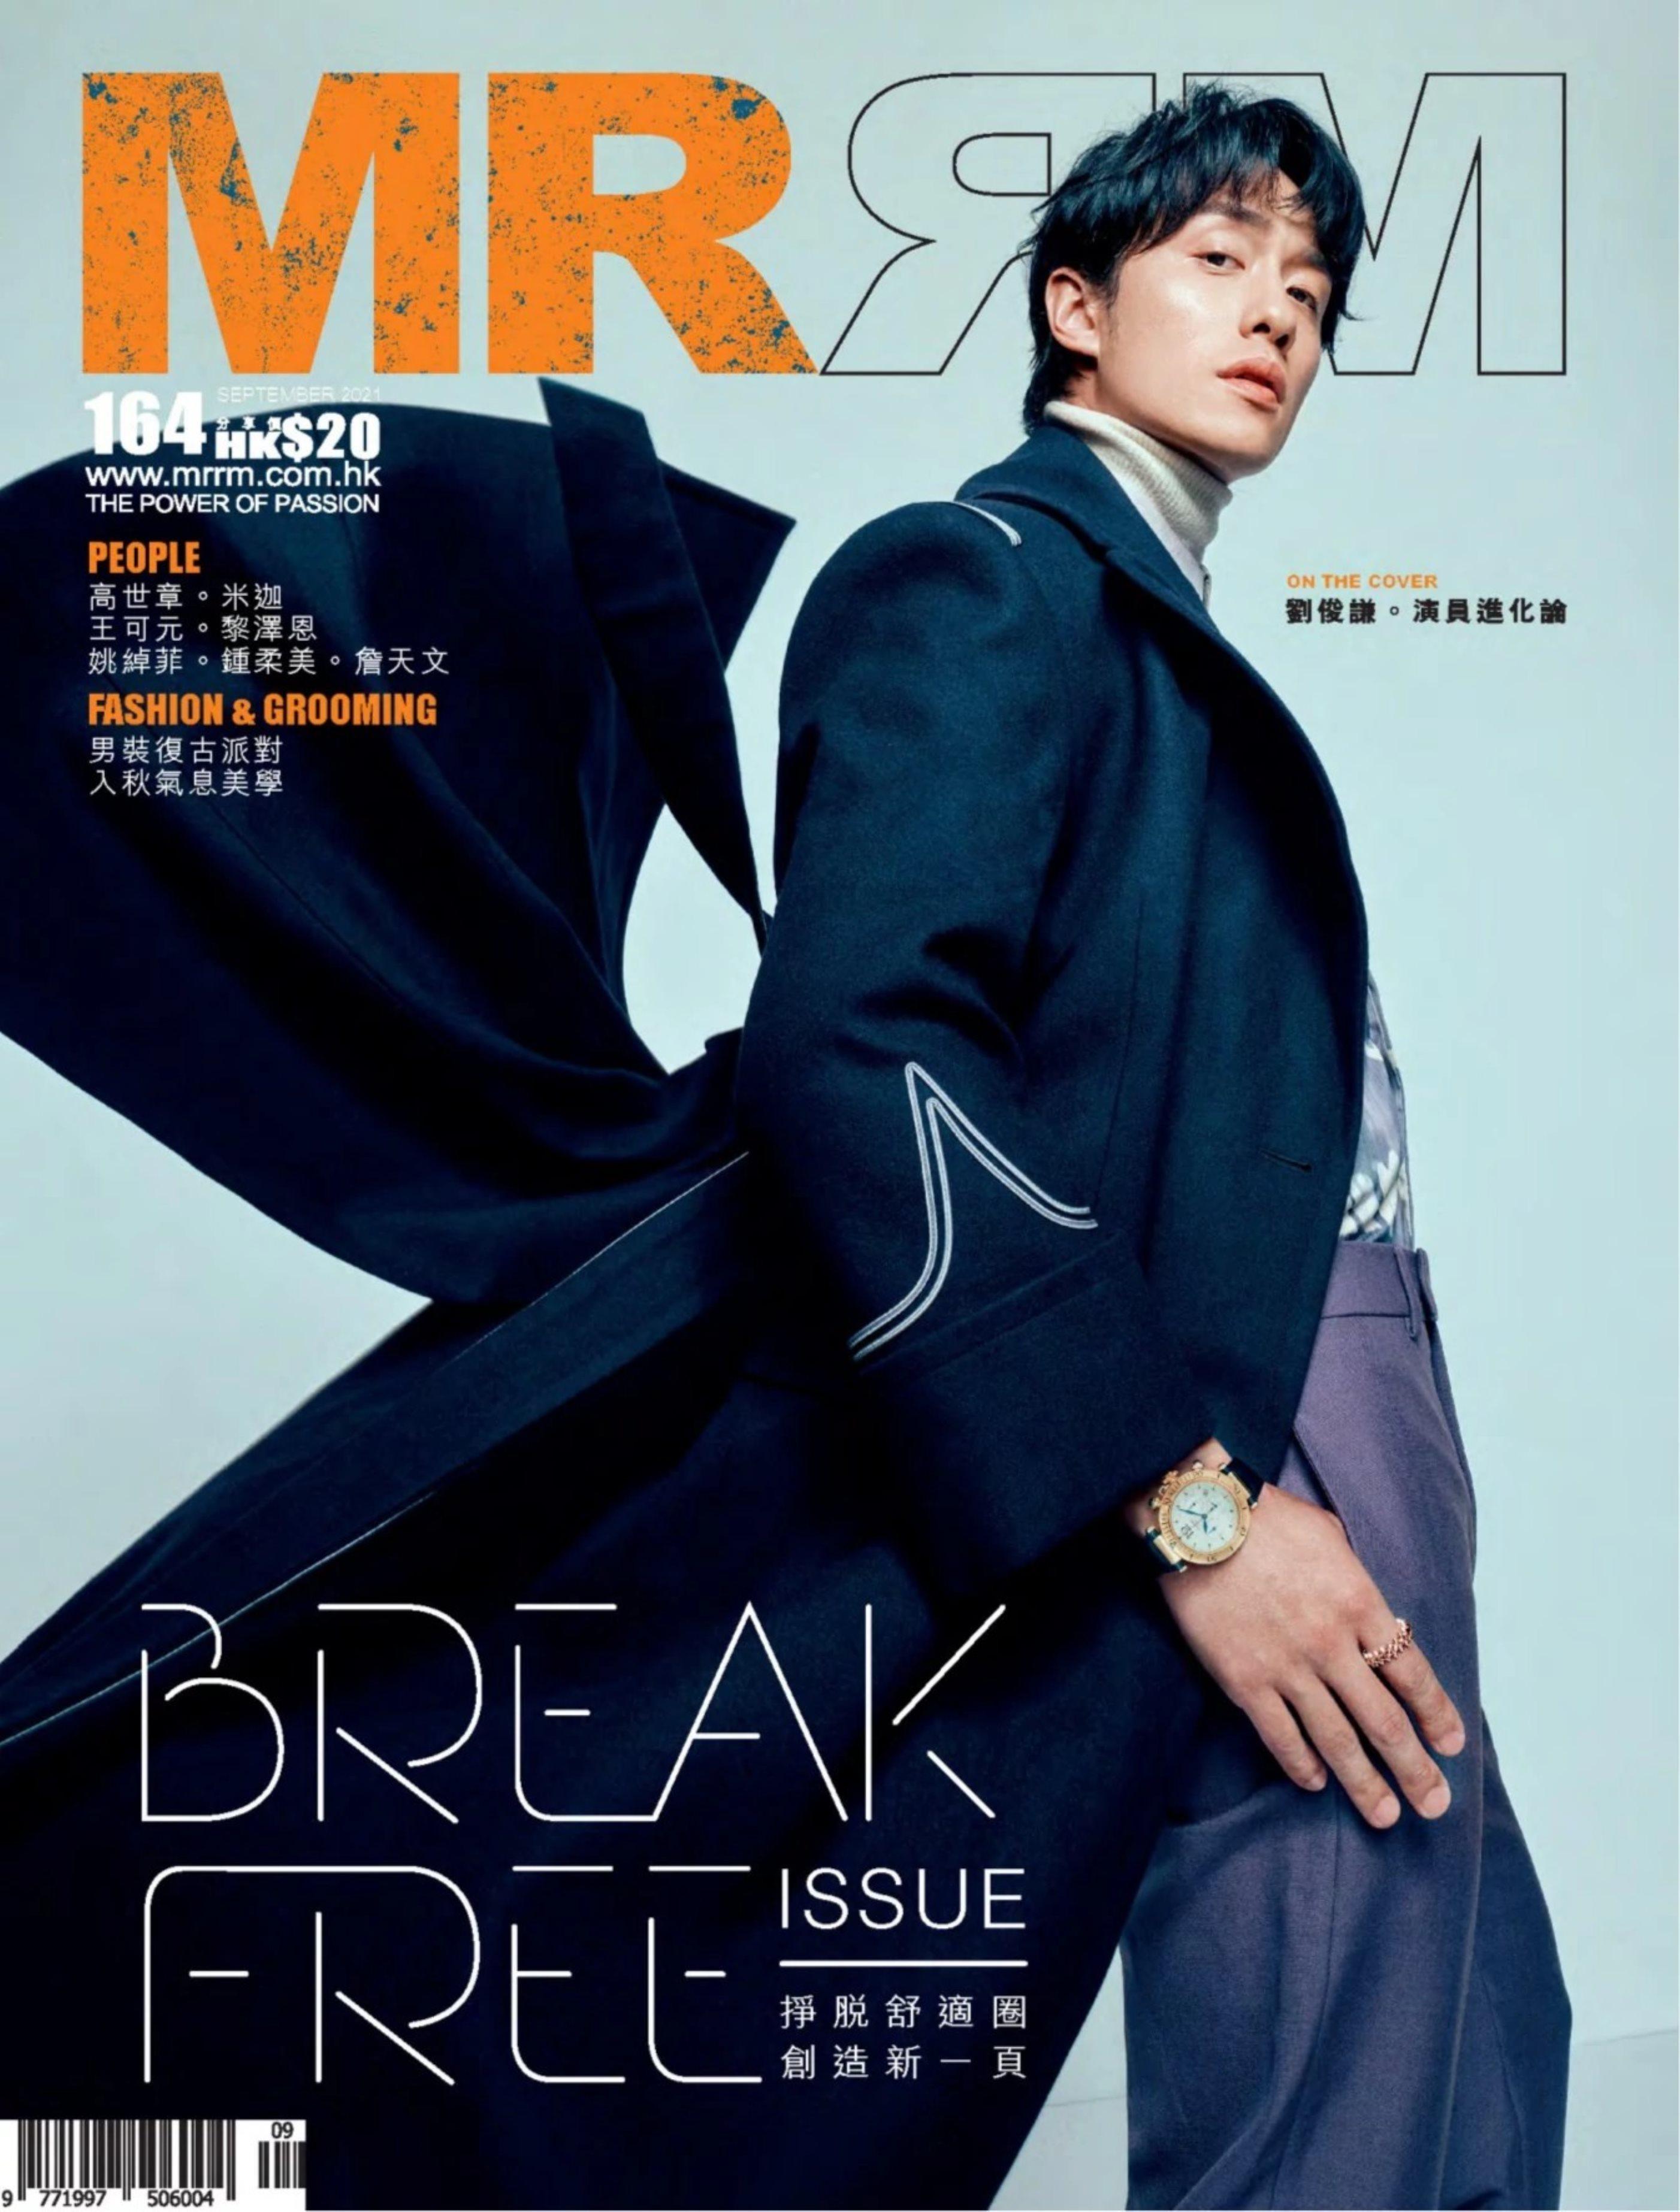 【pdf+jpg格式】香港《MRRM》男性潮流生活时尚杂志2021年9月号插图